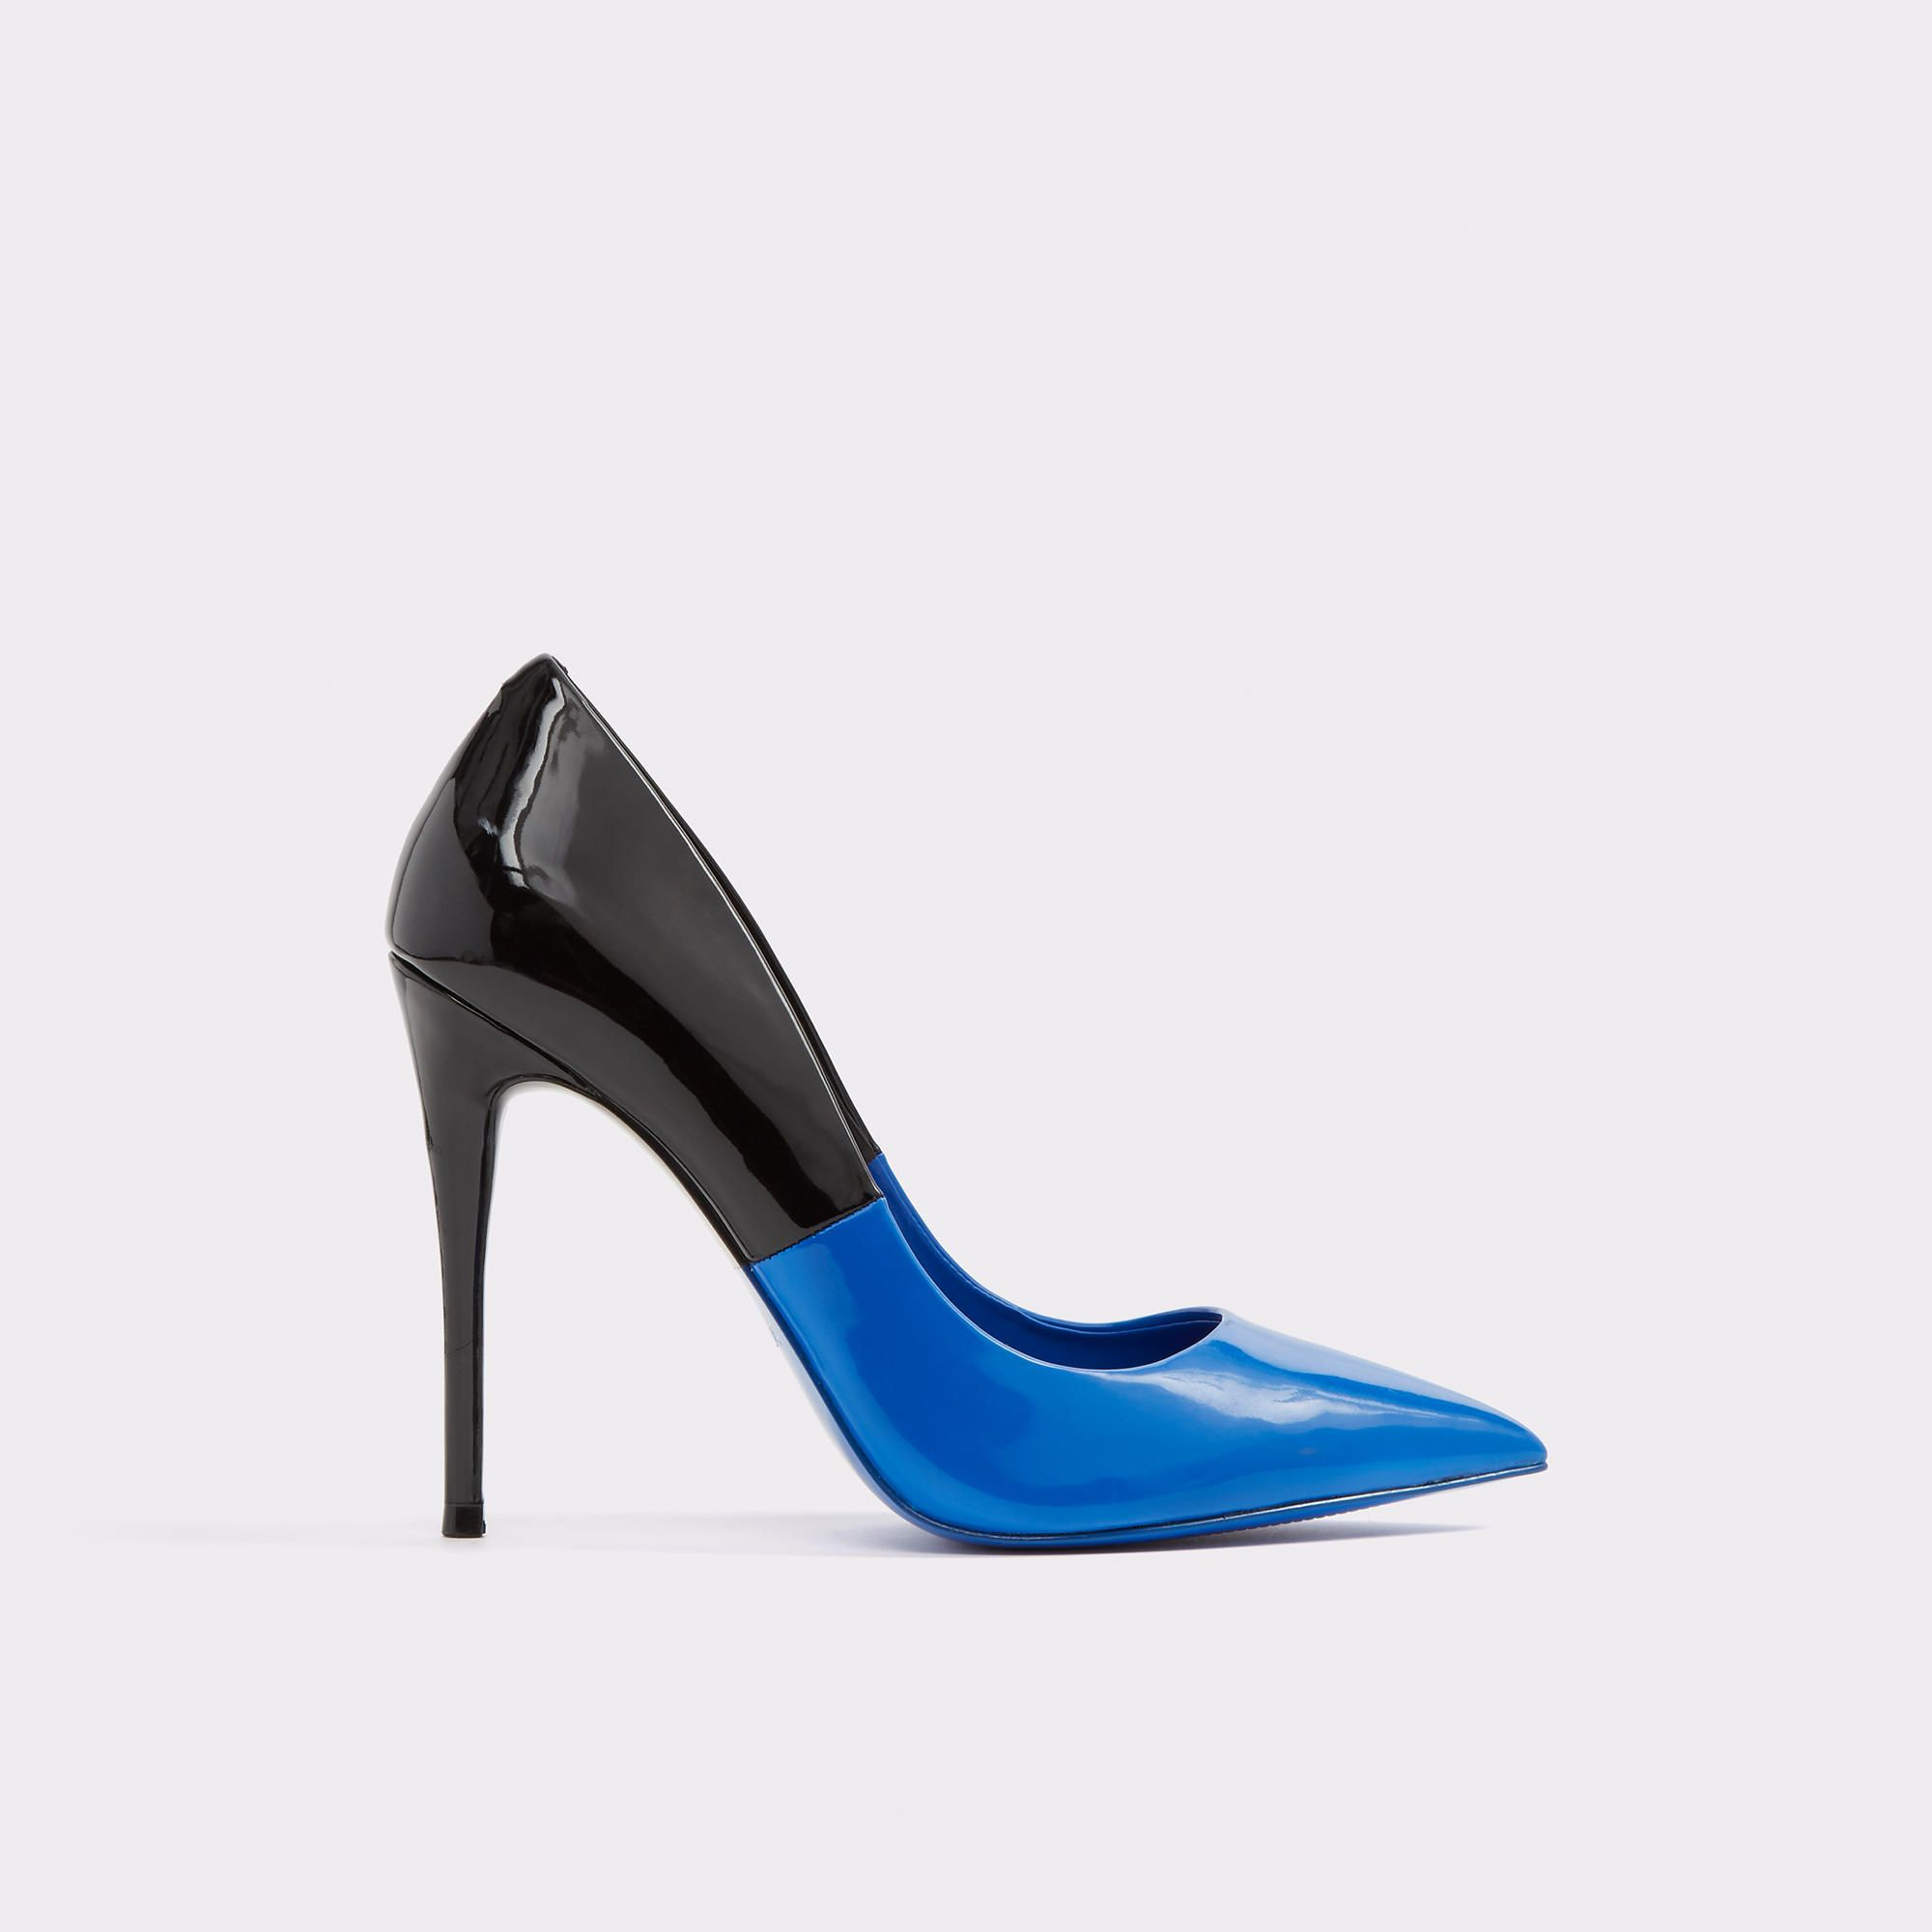 618952577e Stessy Navy Nubuck Women's Court shoes   ALDO UK   Oh, for a walk in ...